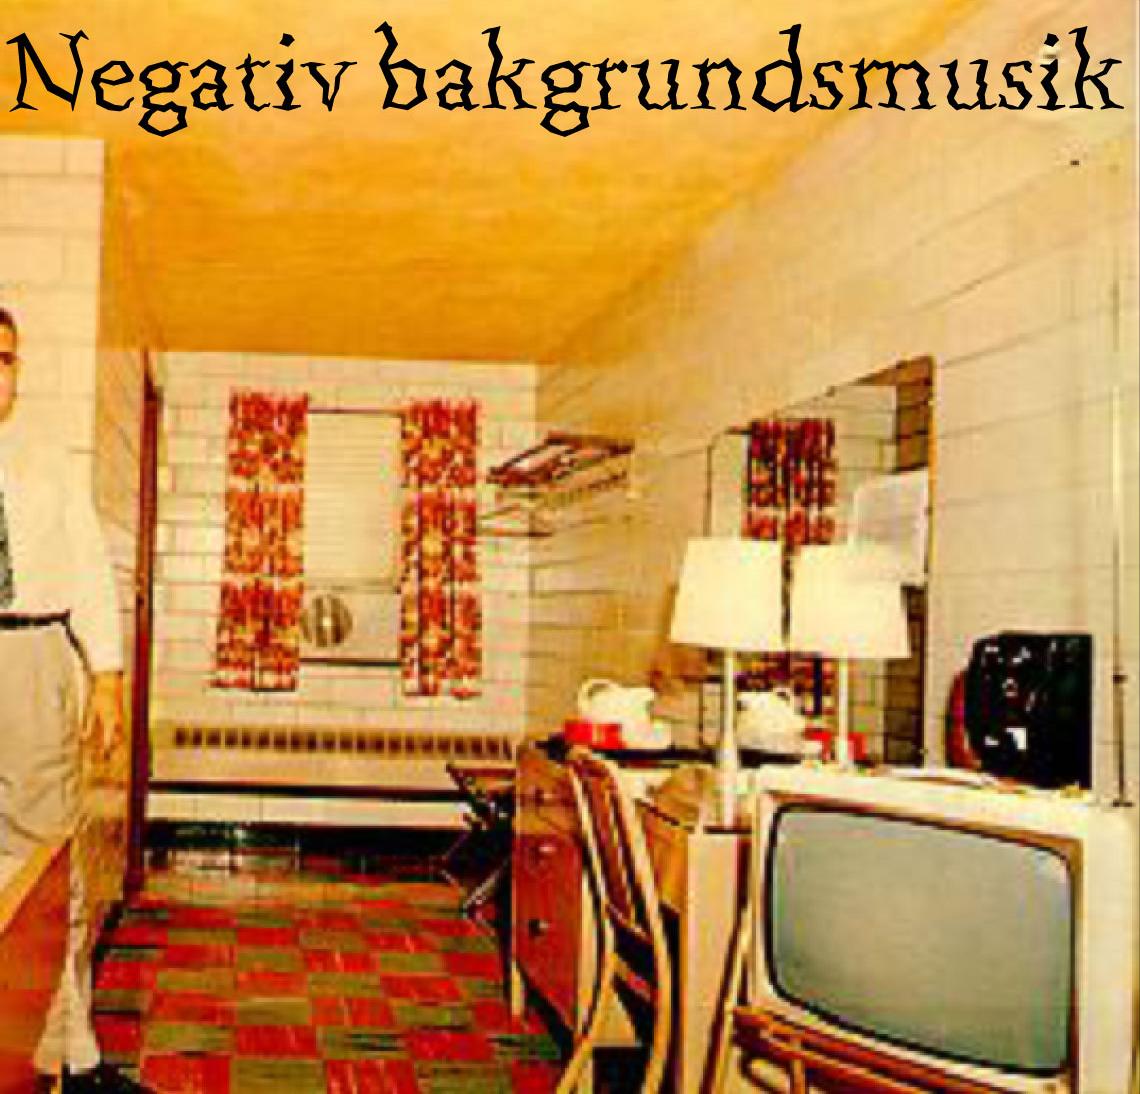 Negativ bakgrundmusik